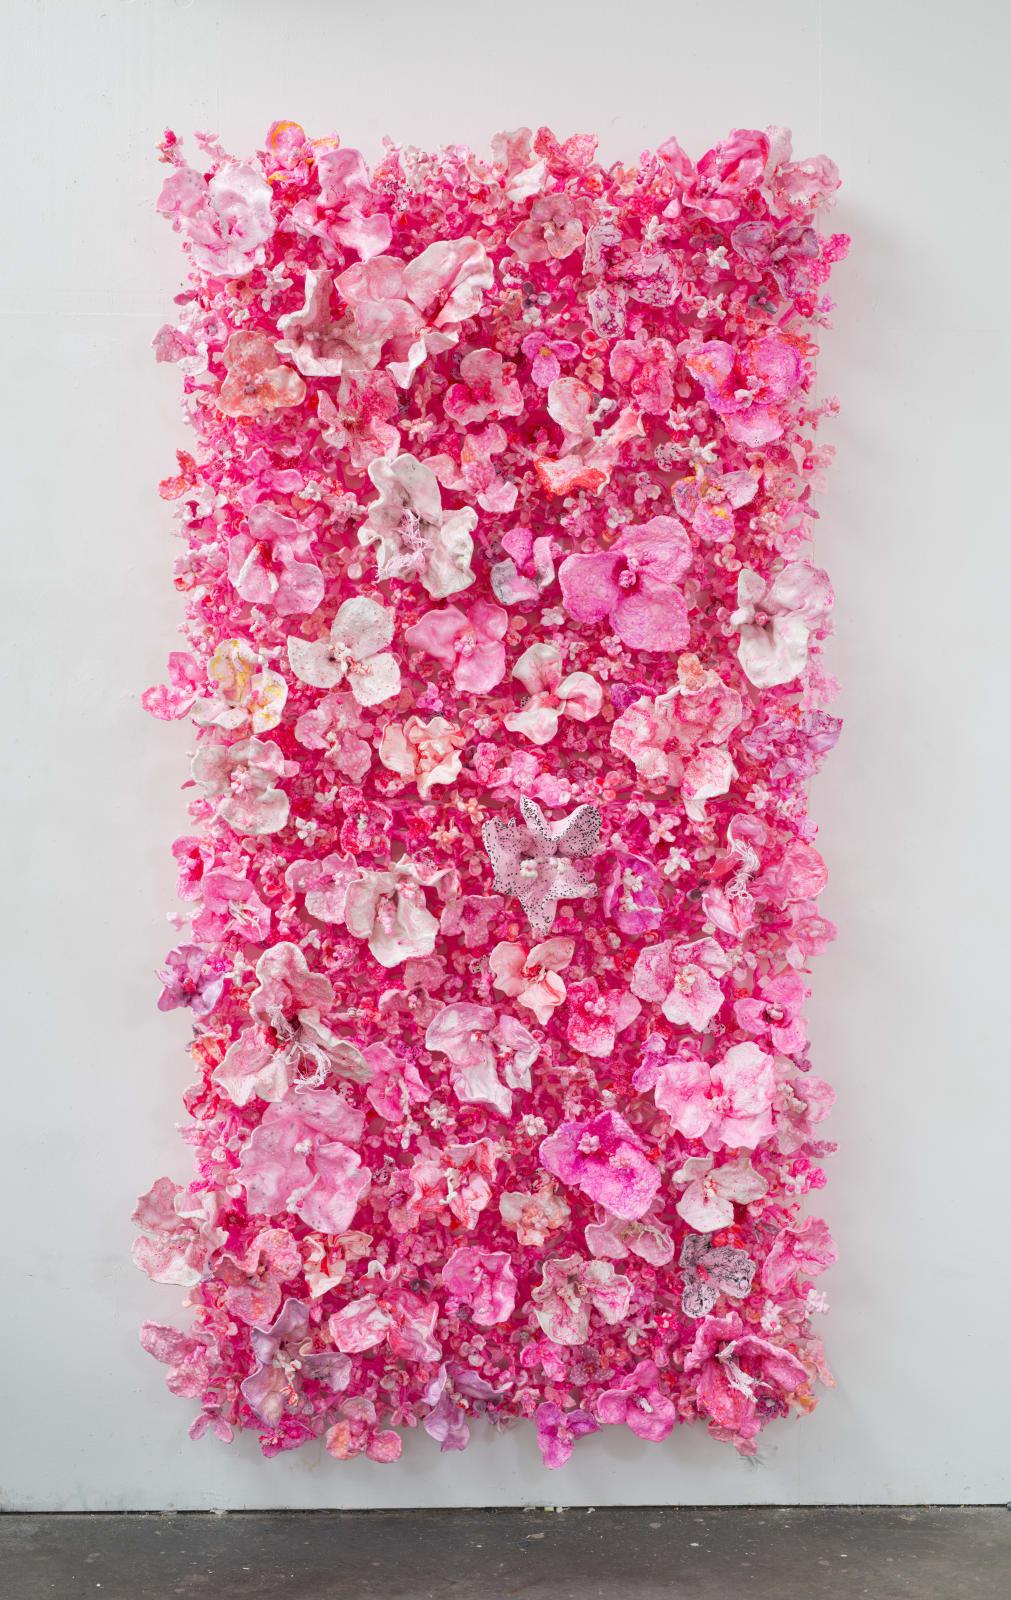 Stefan Gross, Flower Bonanza - Light pink